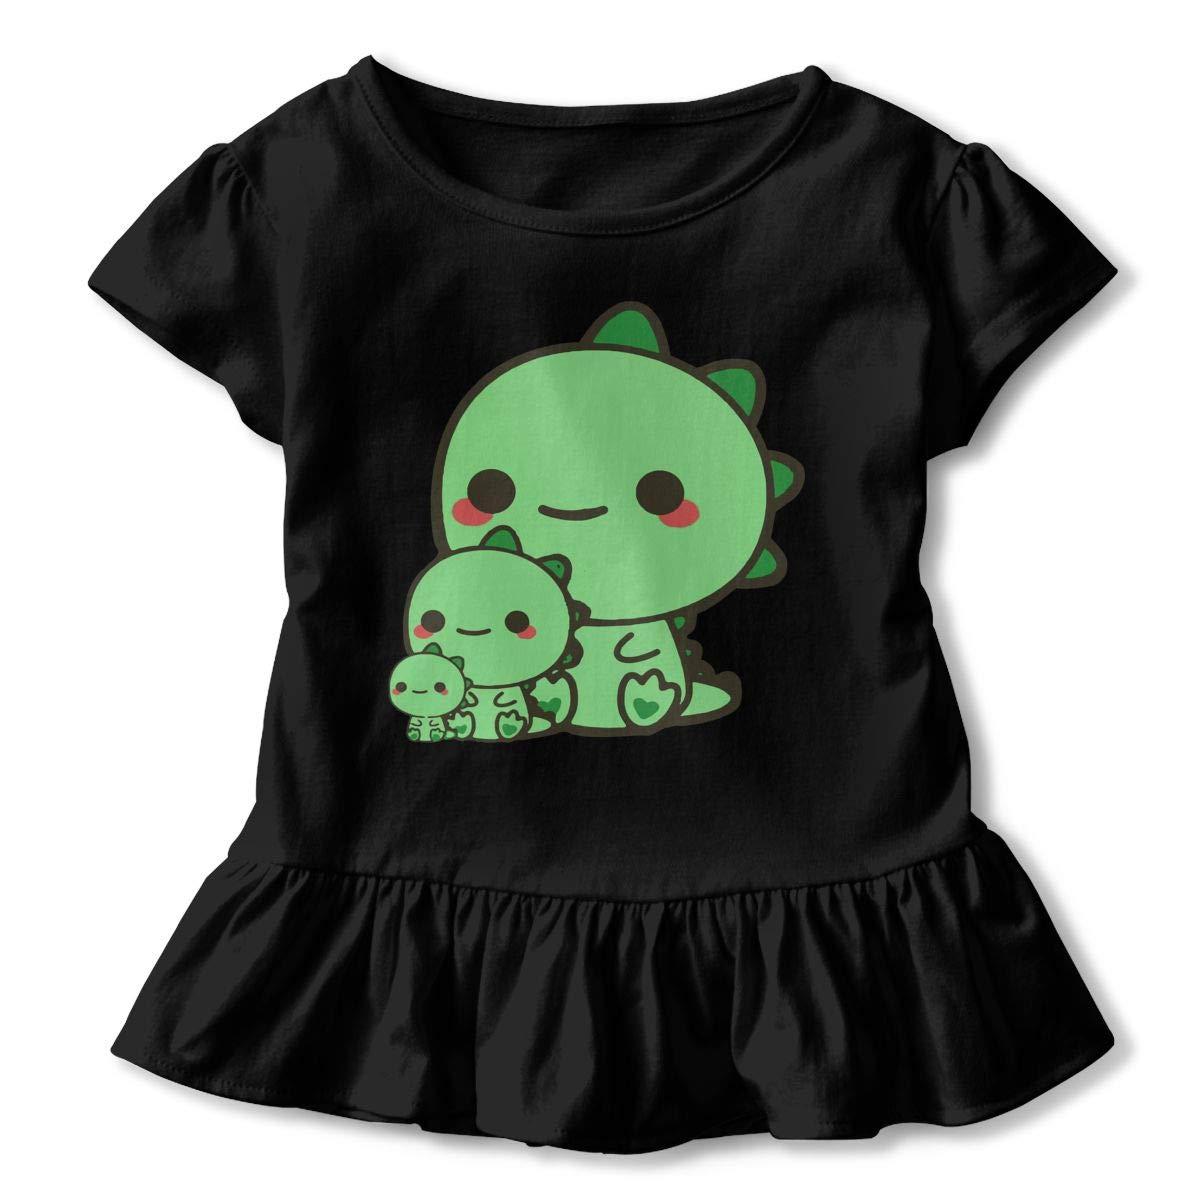 GNKTGBO2O Toddler Girls Cute Baby Dinosaurs 100/% Cotton T Shirts Short Sleeve Ruffle Tee Basic Tops